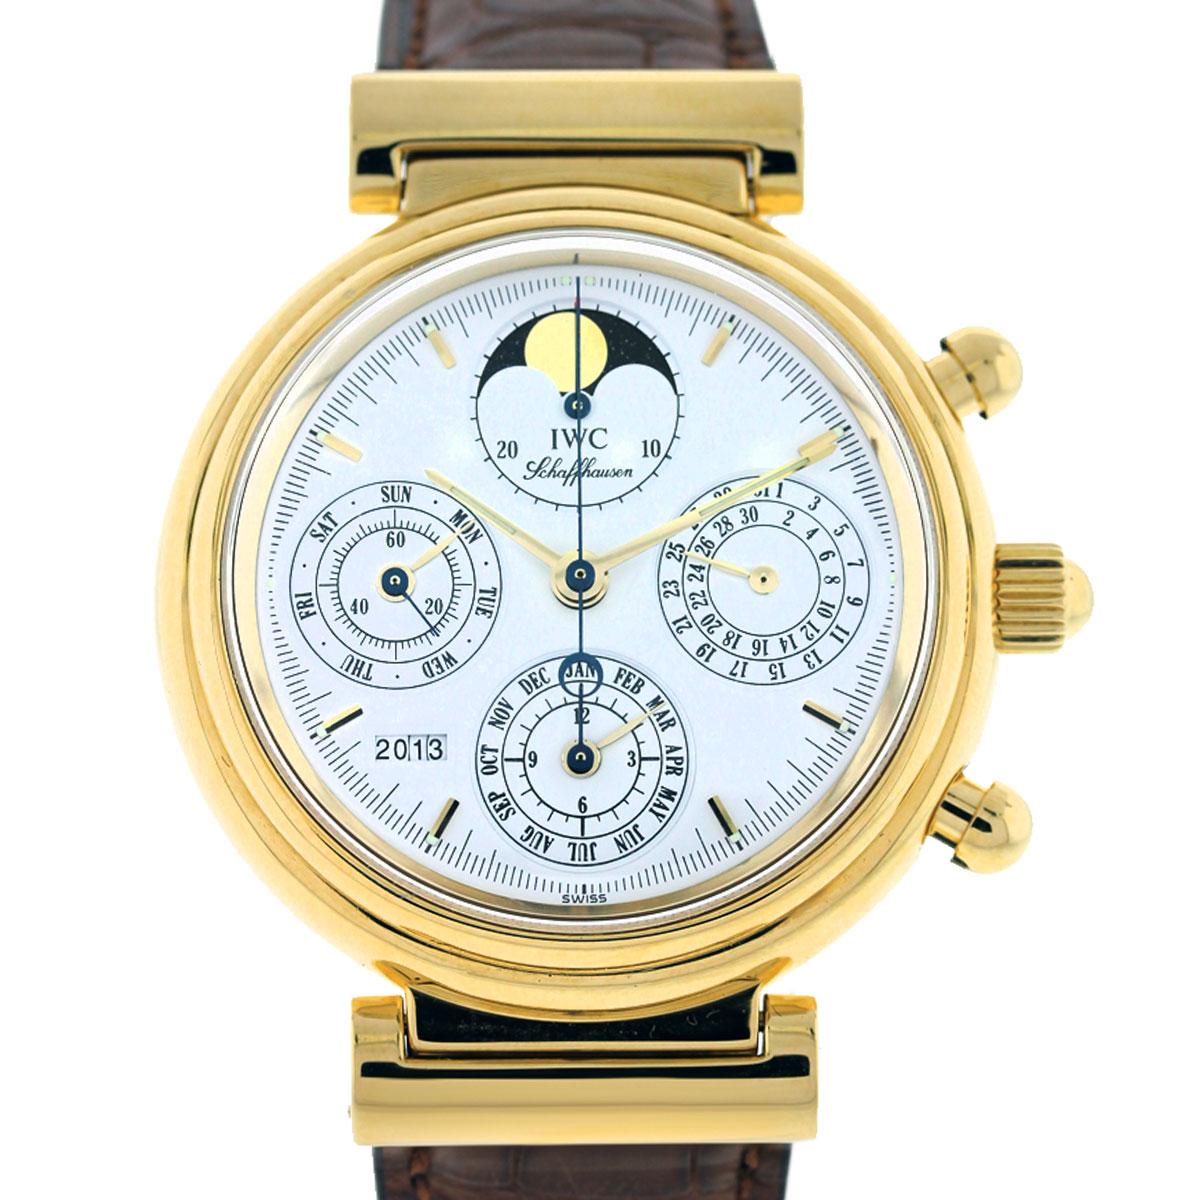 IWC Da Vinci Perpetual Calendar Yellow Gold Mens Watch